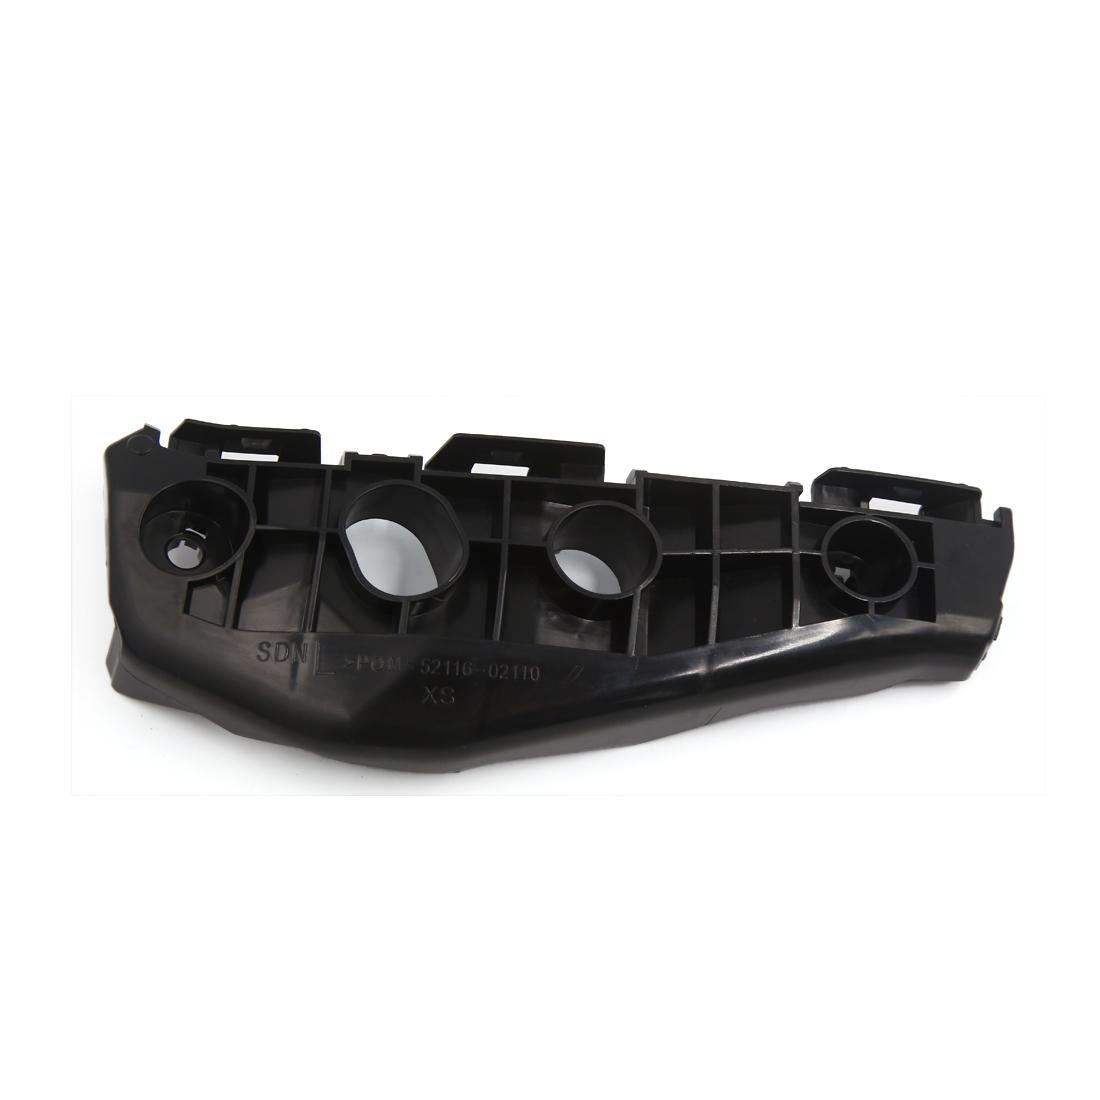 Left Front Bumper Bracket Support Replacement Black 52116-02110 for Carola